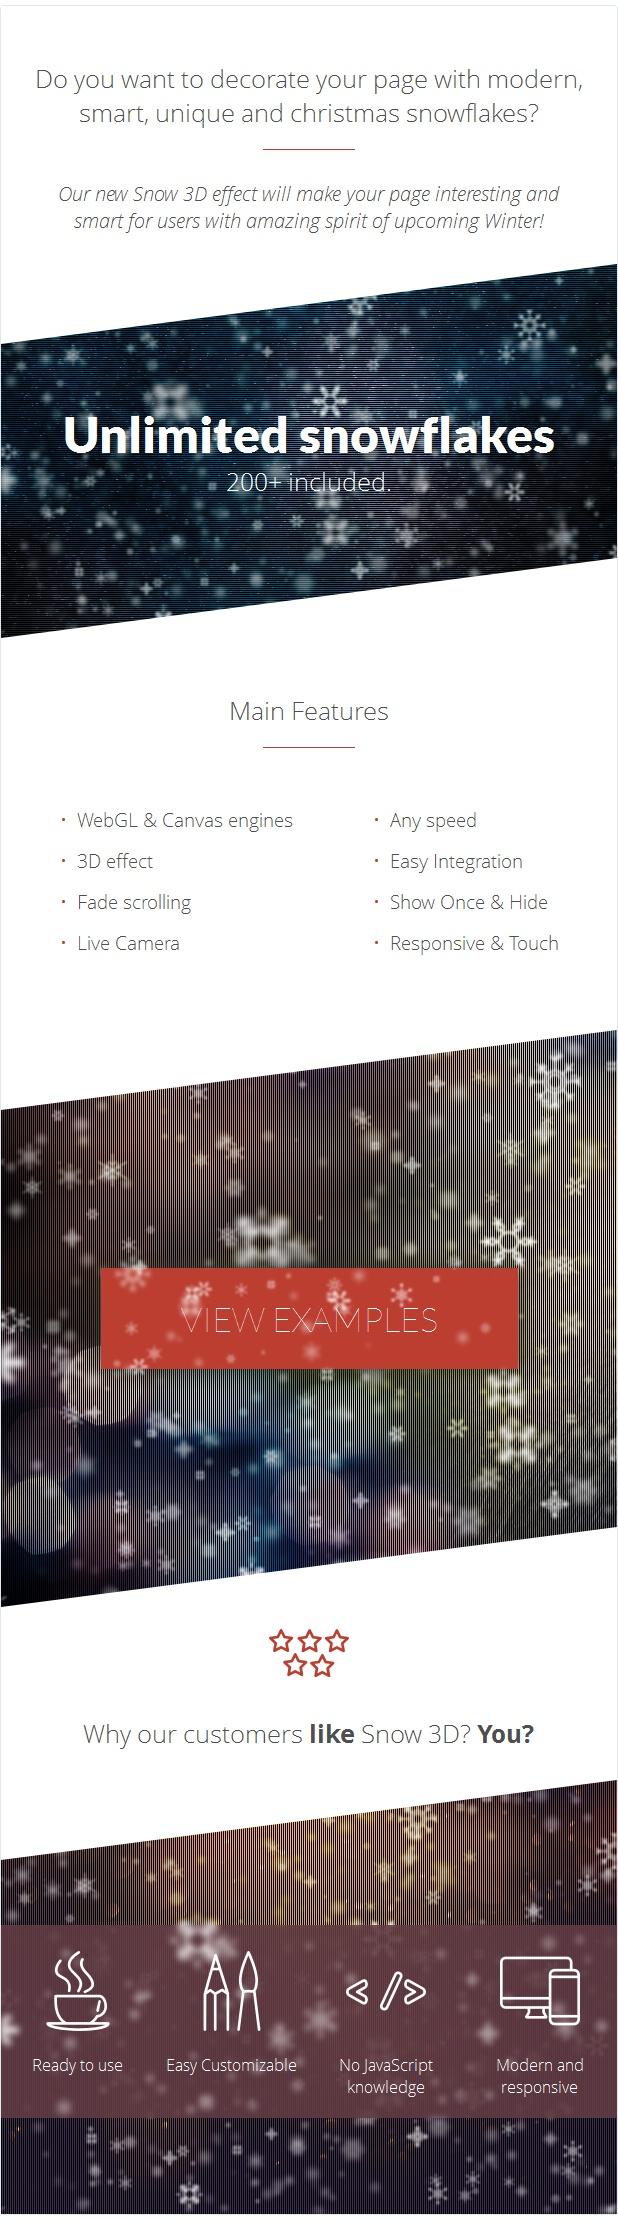 1 - Snow 3D - Christmas Plugin for WordPress